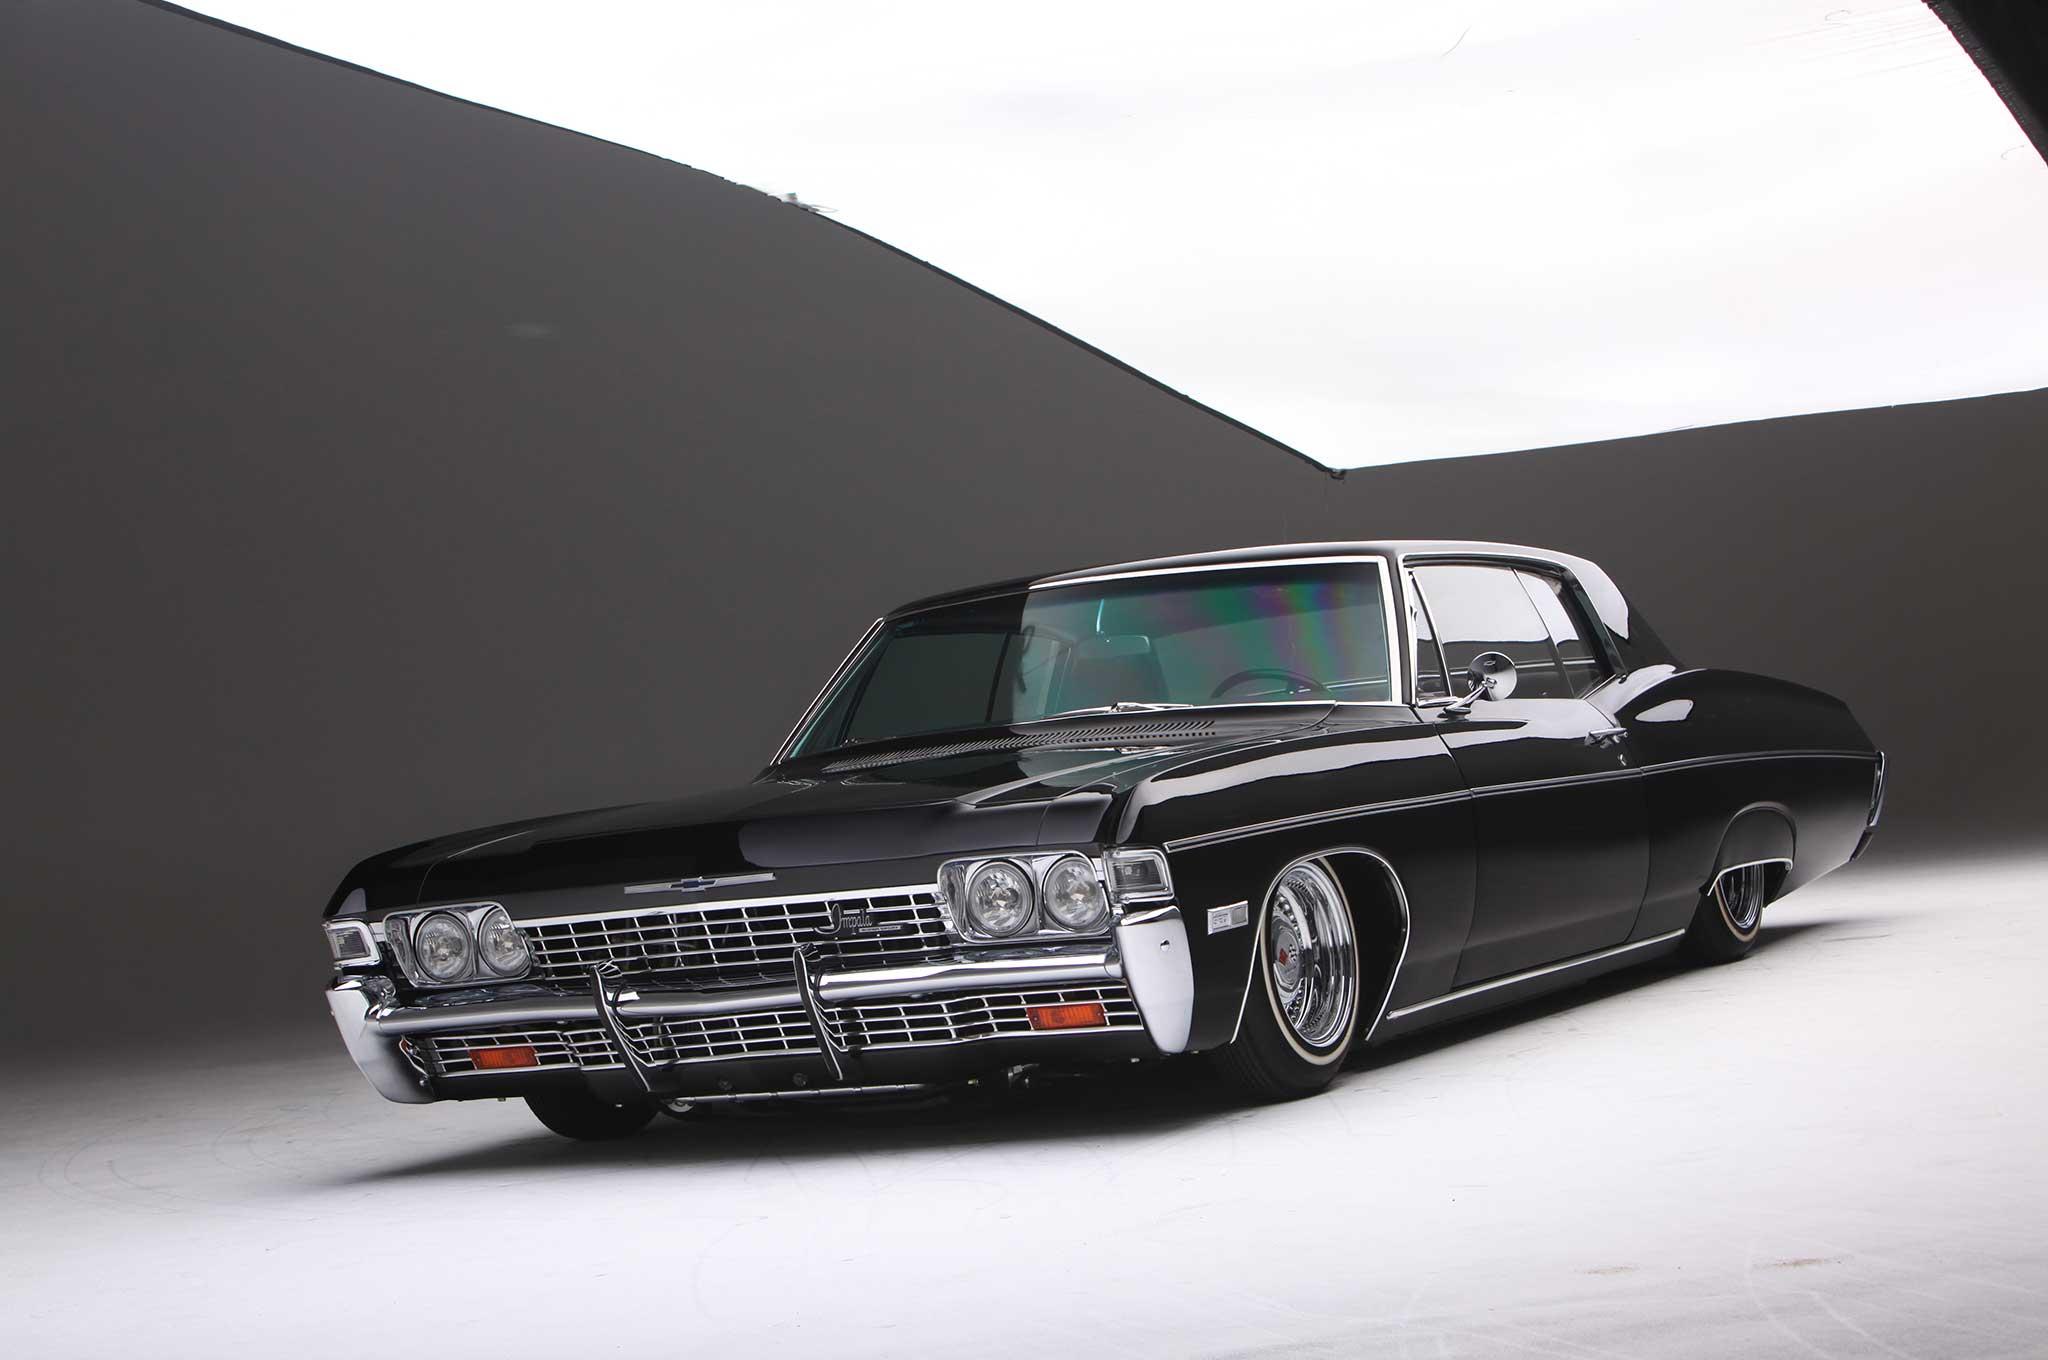 2018 Chevy Impala Ss >> 1968 Chevrolet Impala SS - Black on Black Comeback - Lowrider